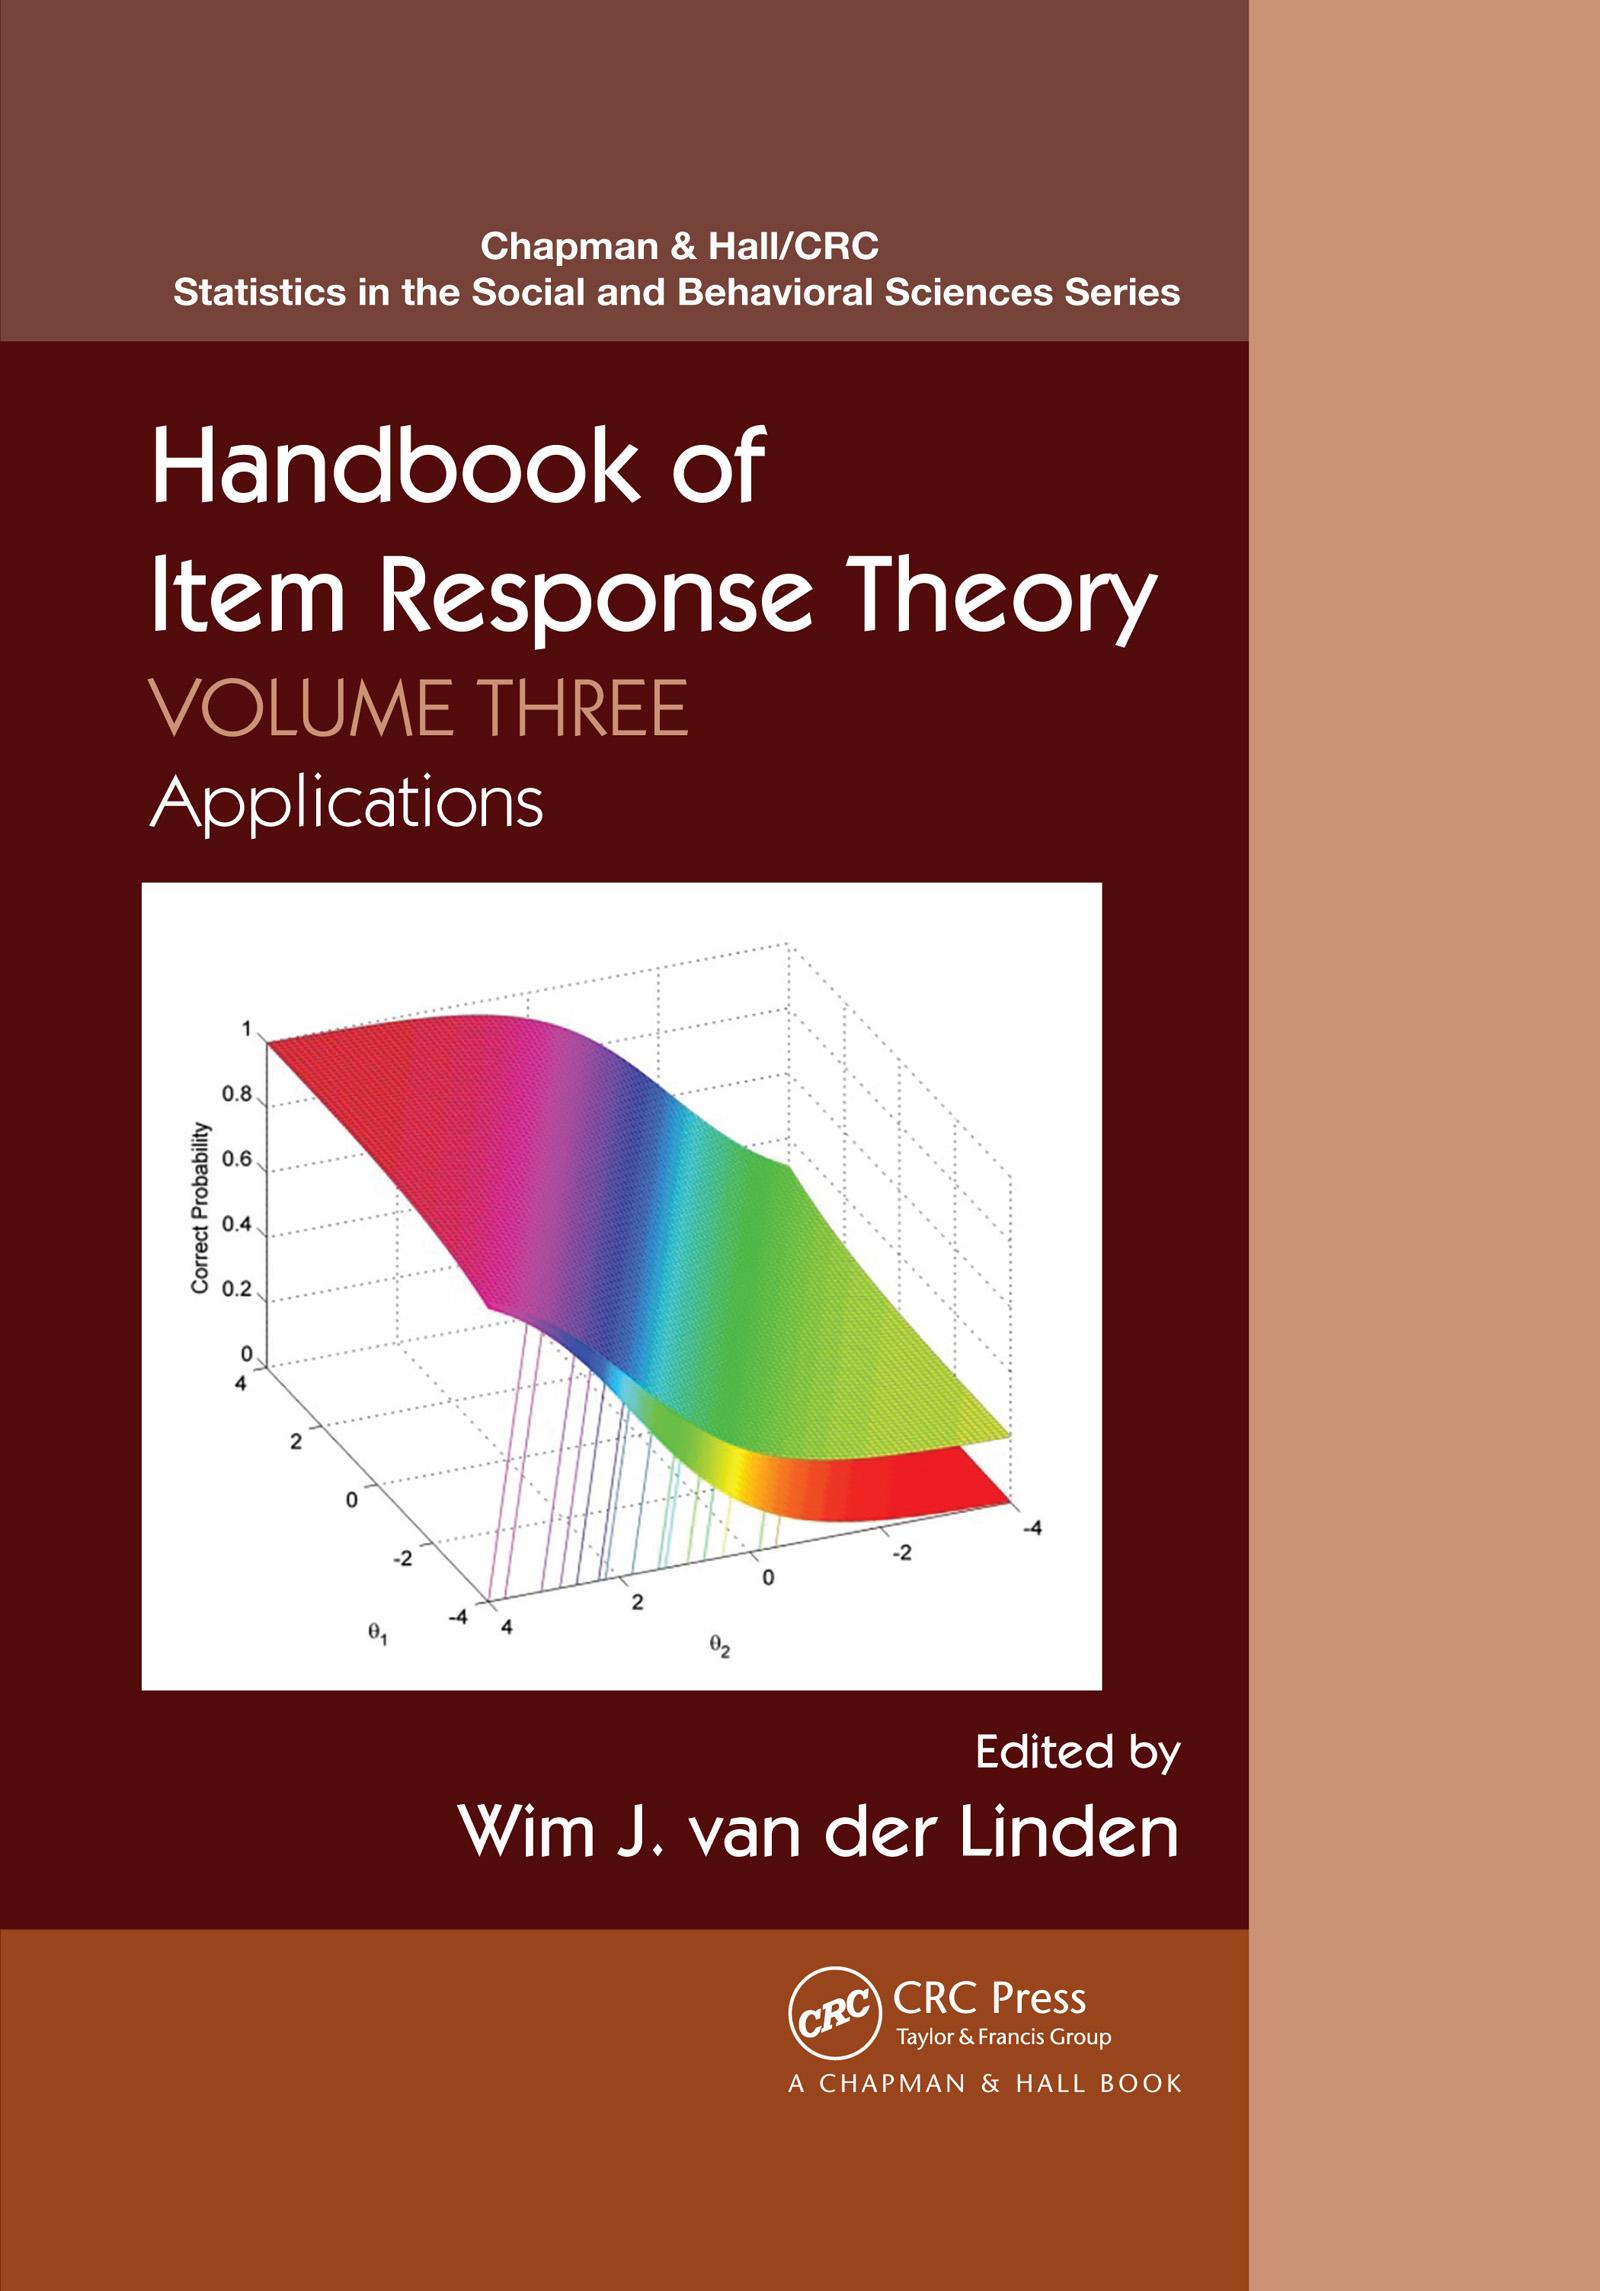 Handbook of Item Response Theory, Volume Three_PBD Applications